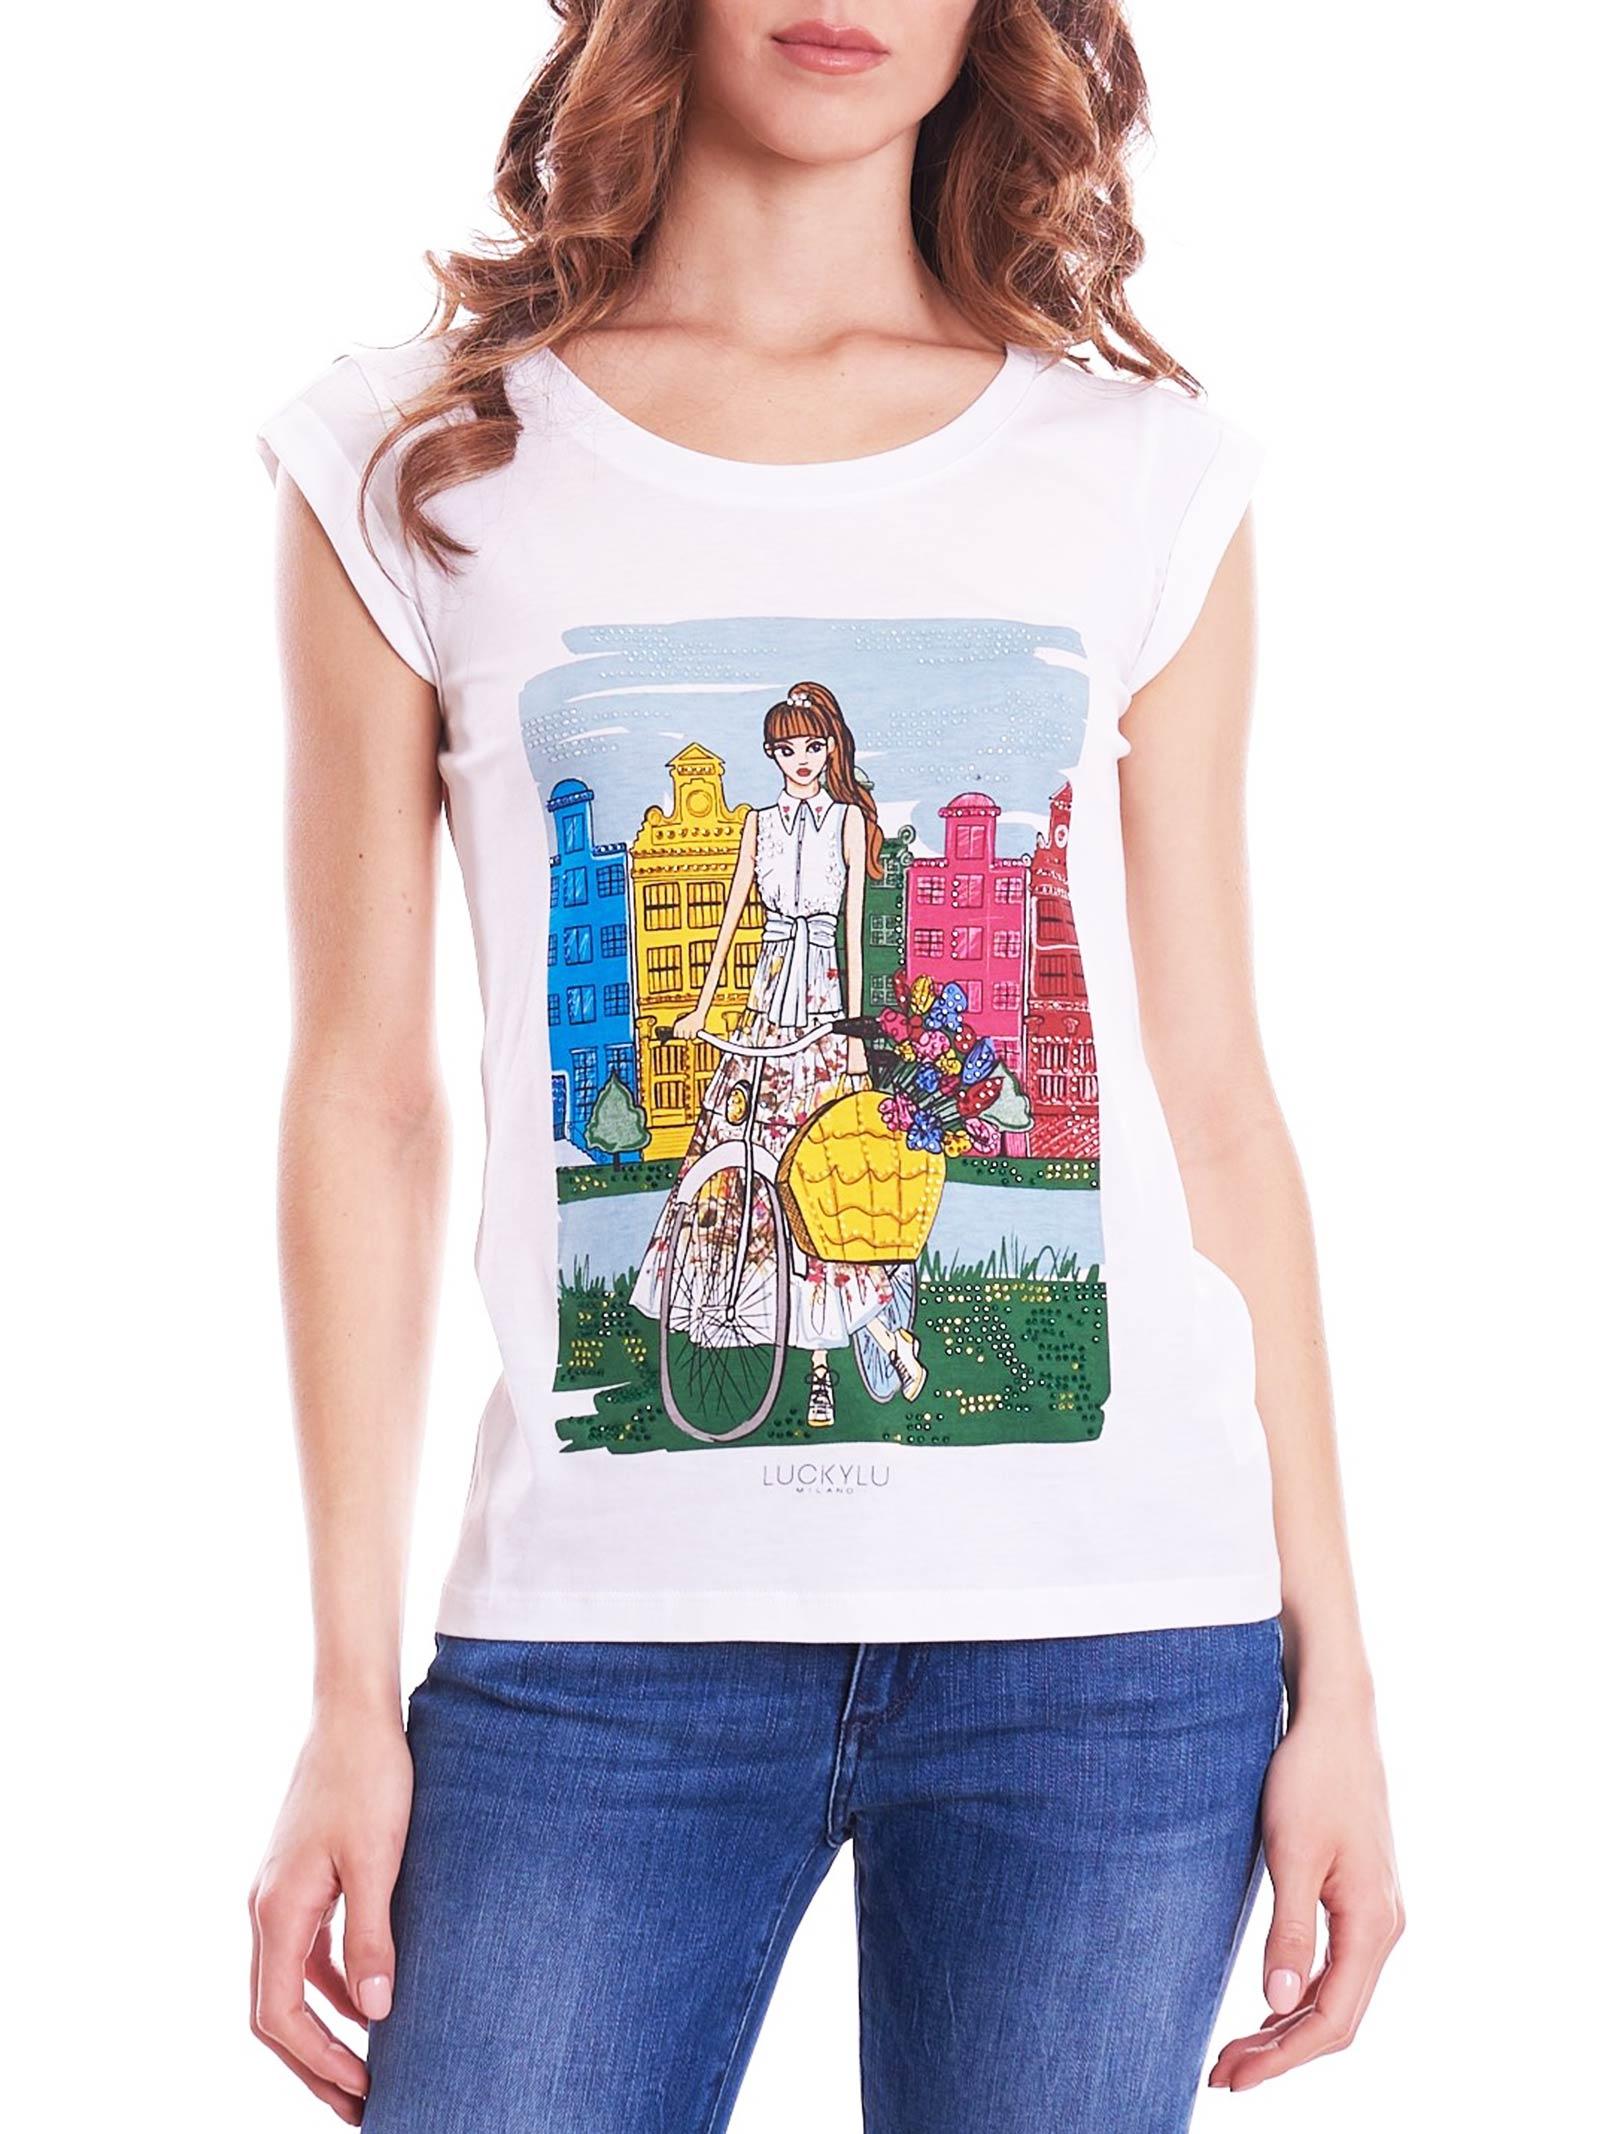 LUCKYLU   T-Shirts   TS09JJ0001